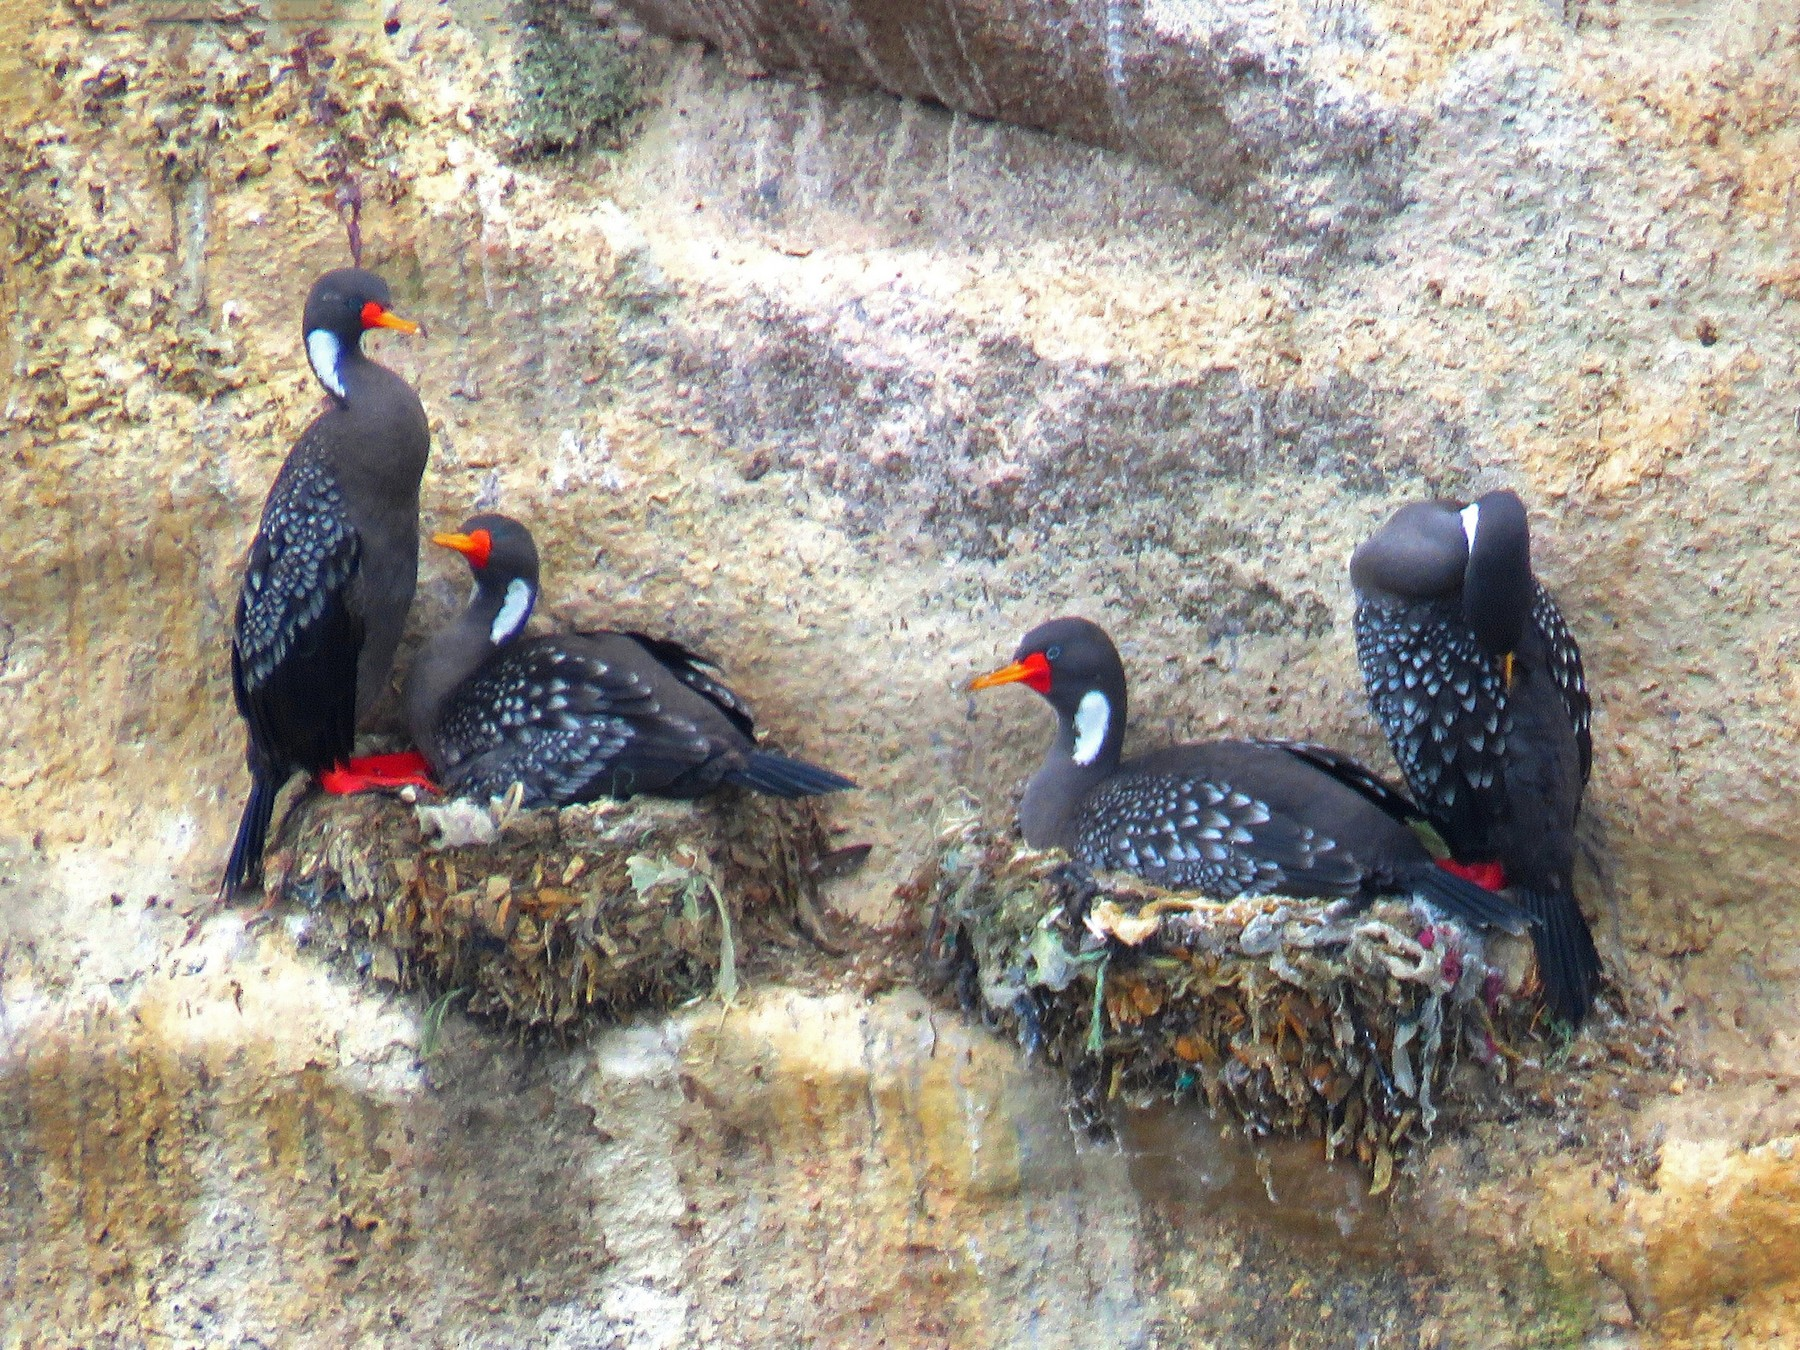 Red-legged Cormorant - Marcelo Olivares Herrera